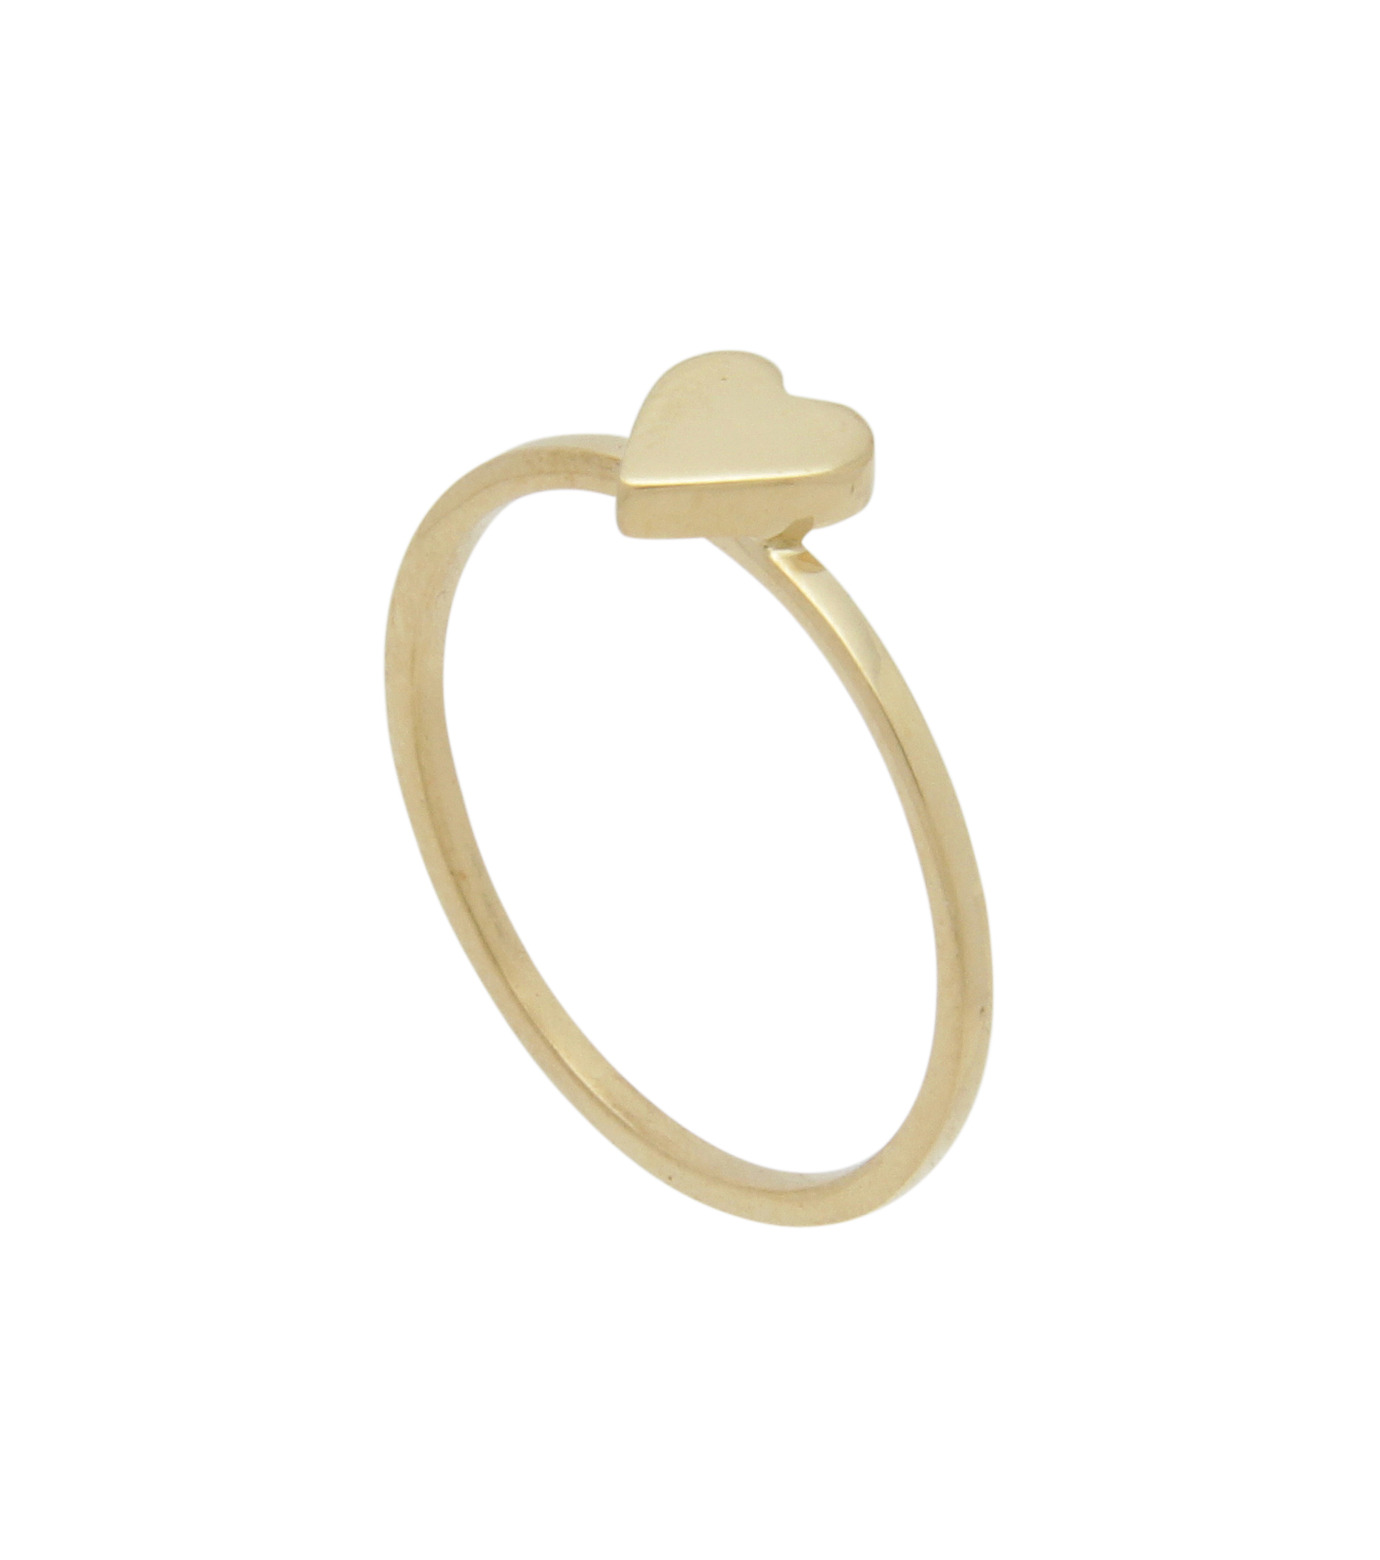 Ileana Makri(イリーナ マクリ)のLove Ring Yellow Gold-YELLOW(リング/ring)-O272-02-099-32 拡大詳細画像2